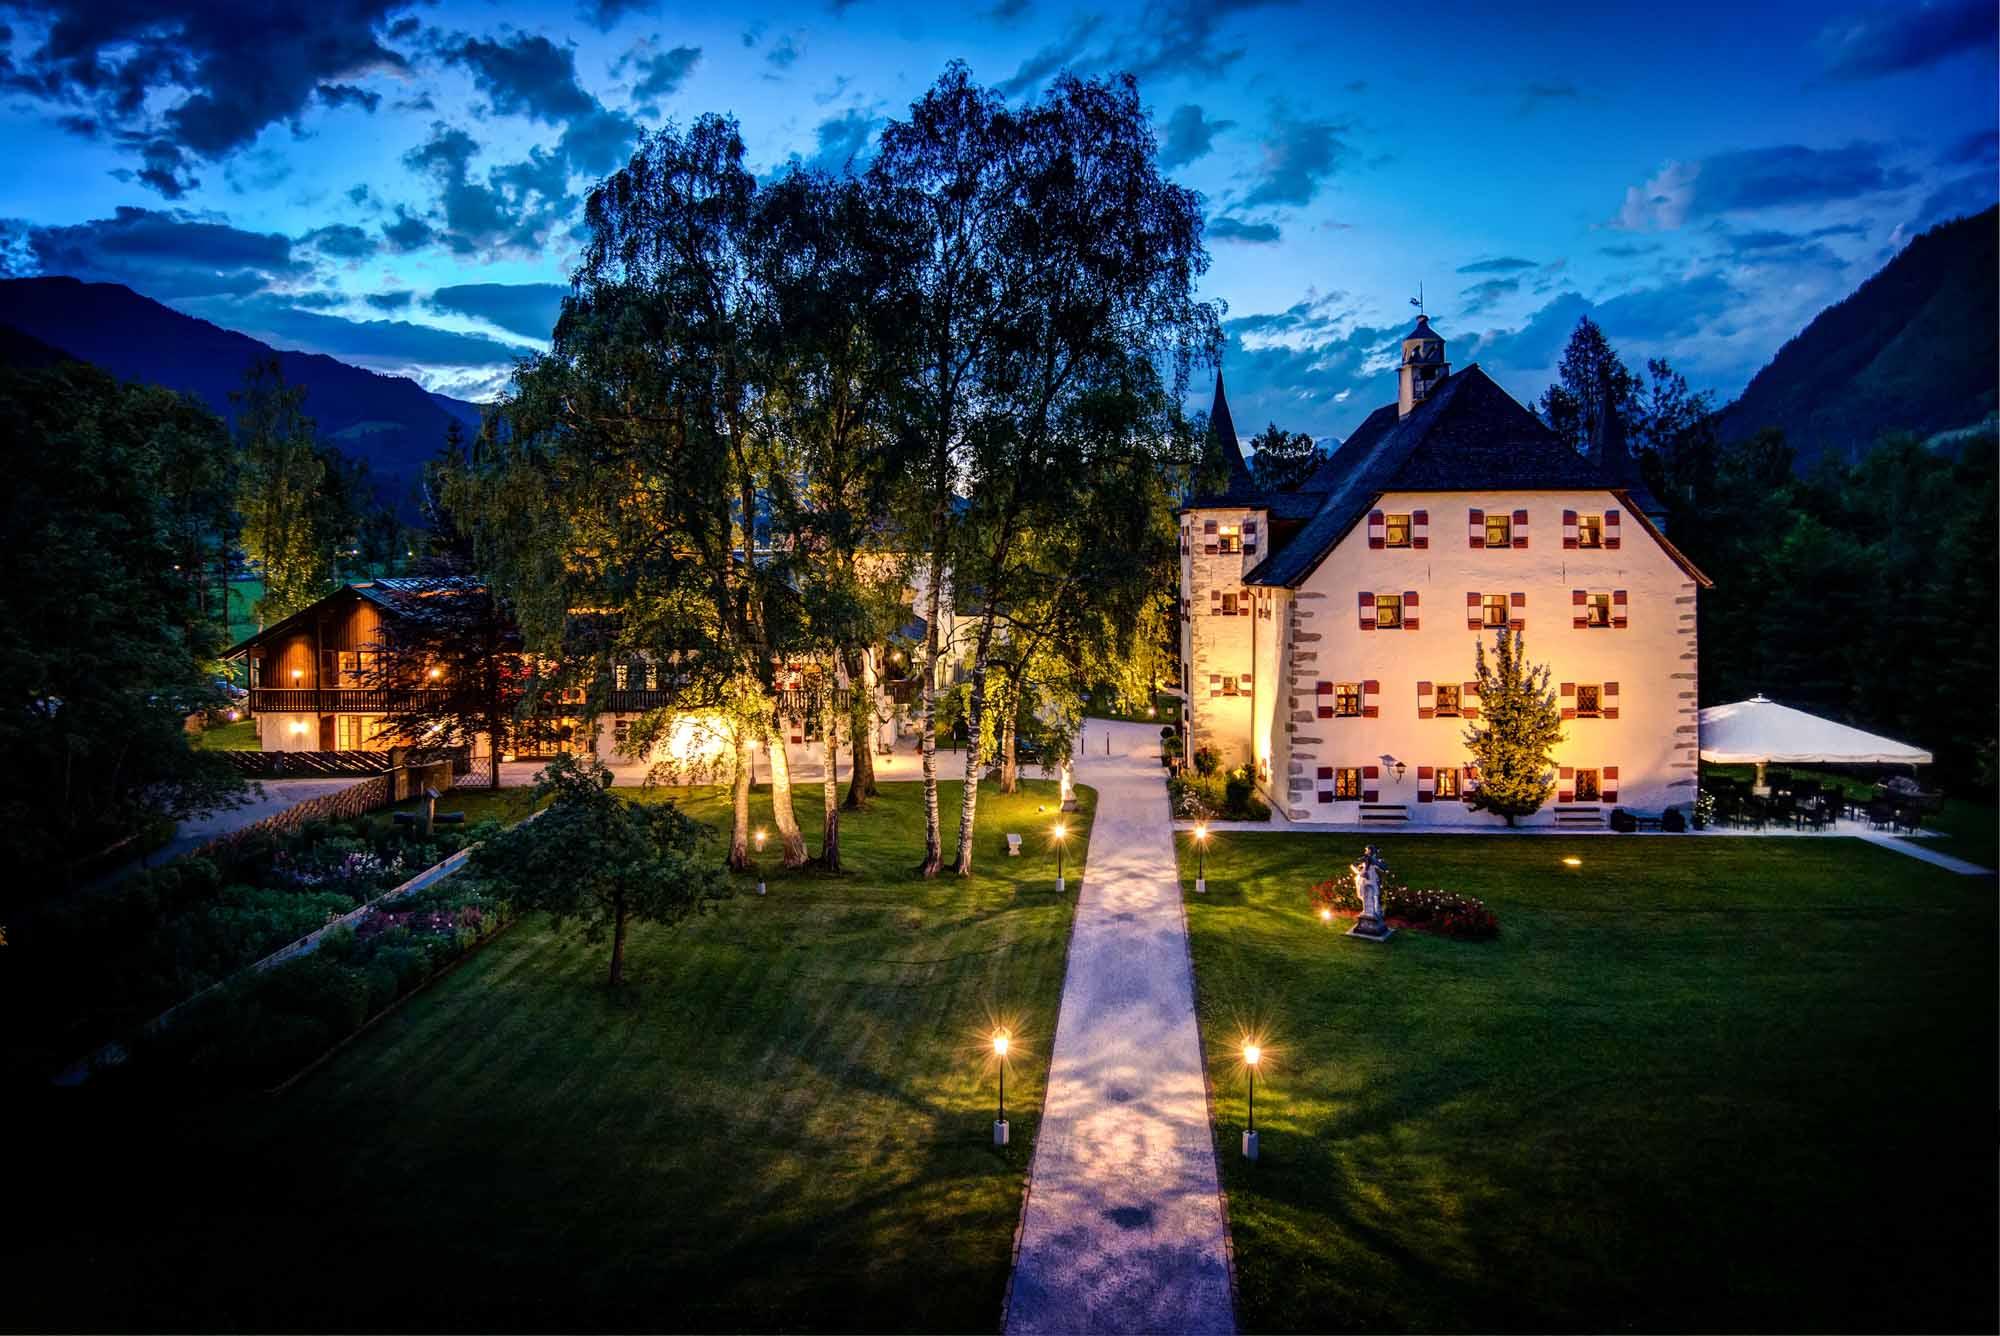 Schloss Prielau